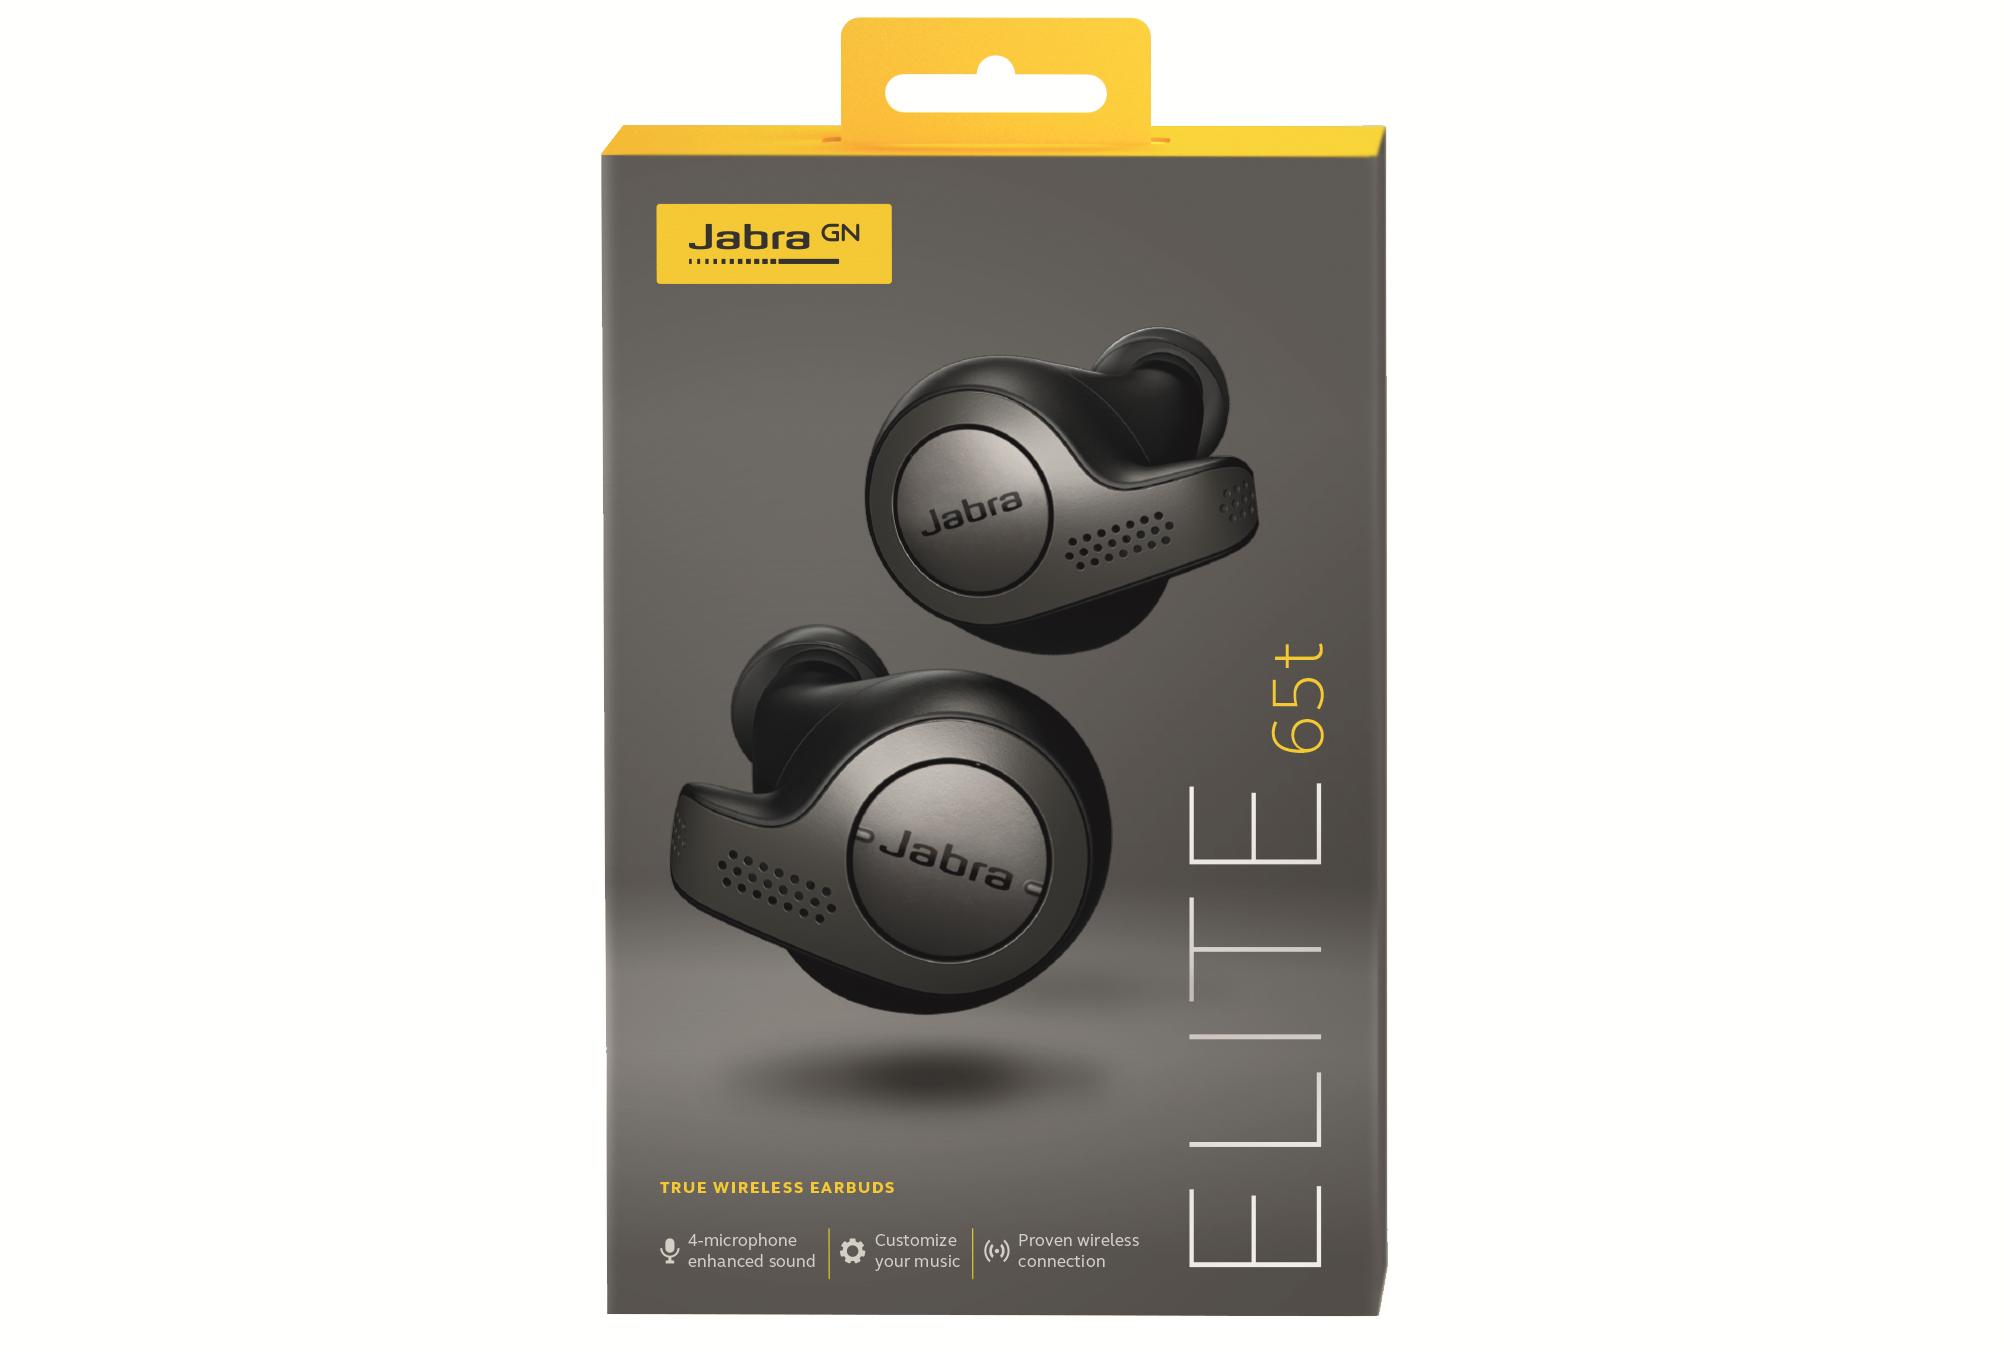 The Jabra Elite 65t True Wireless Earbuds